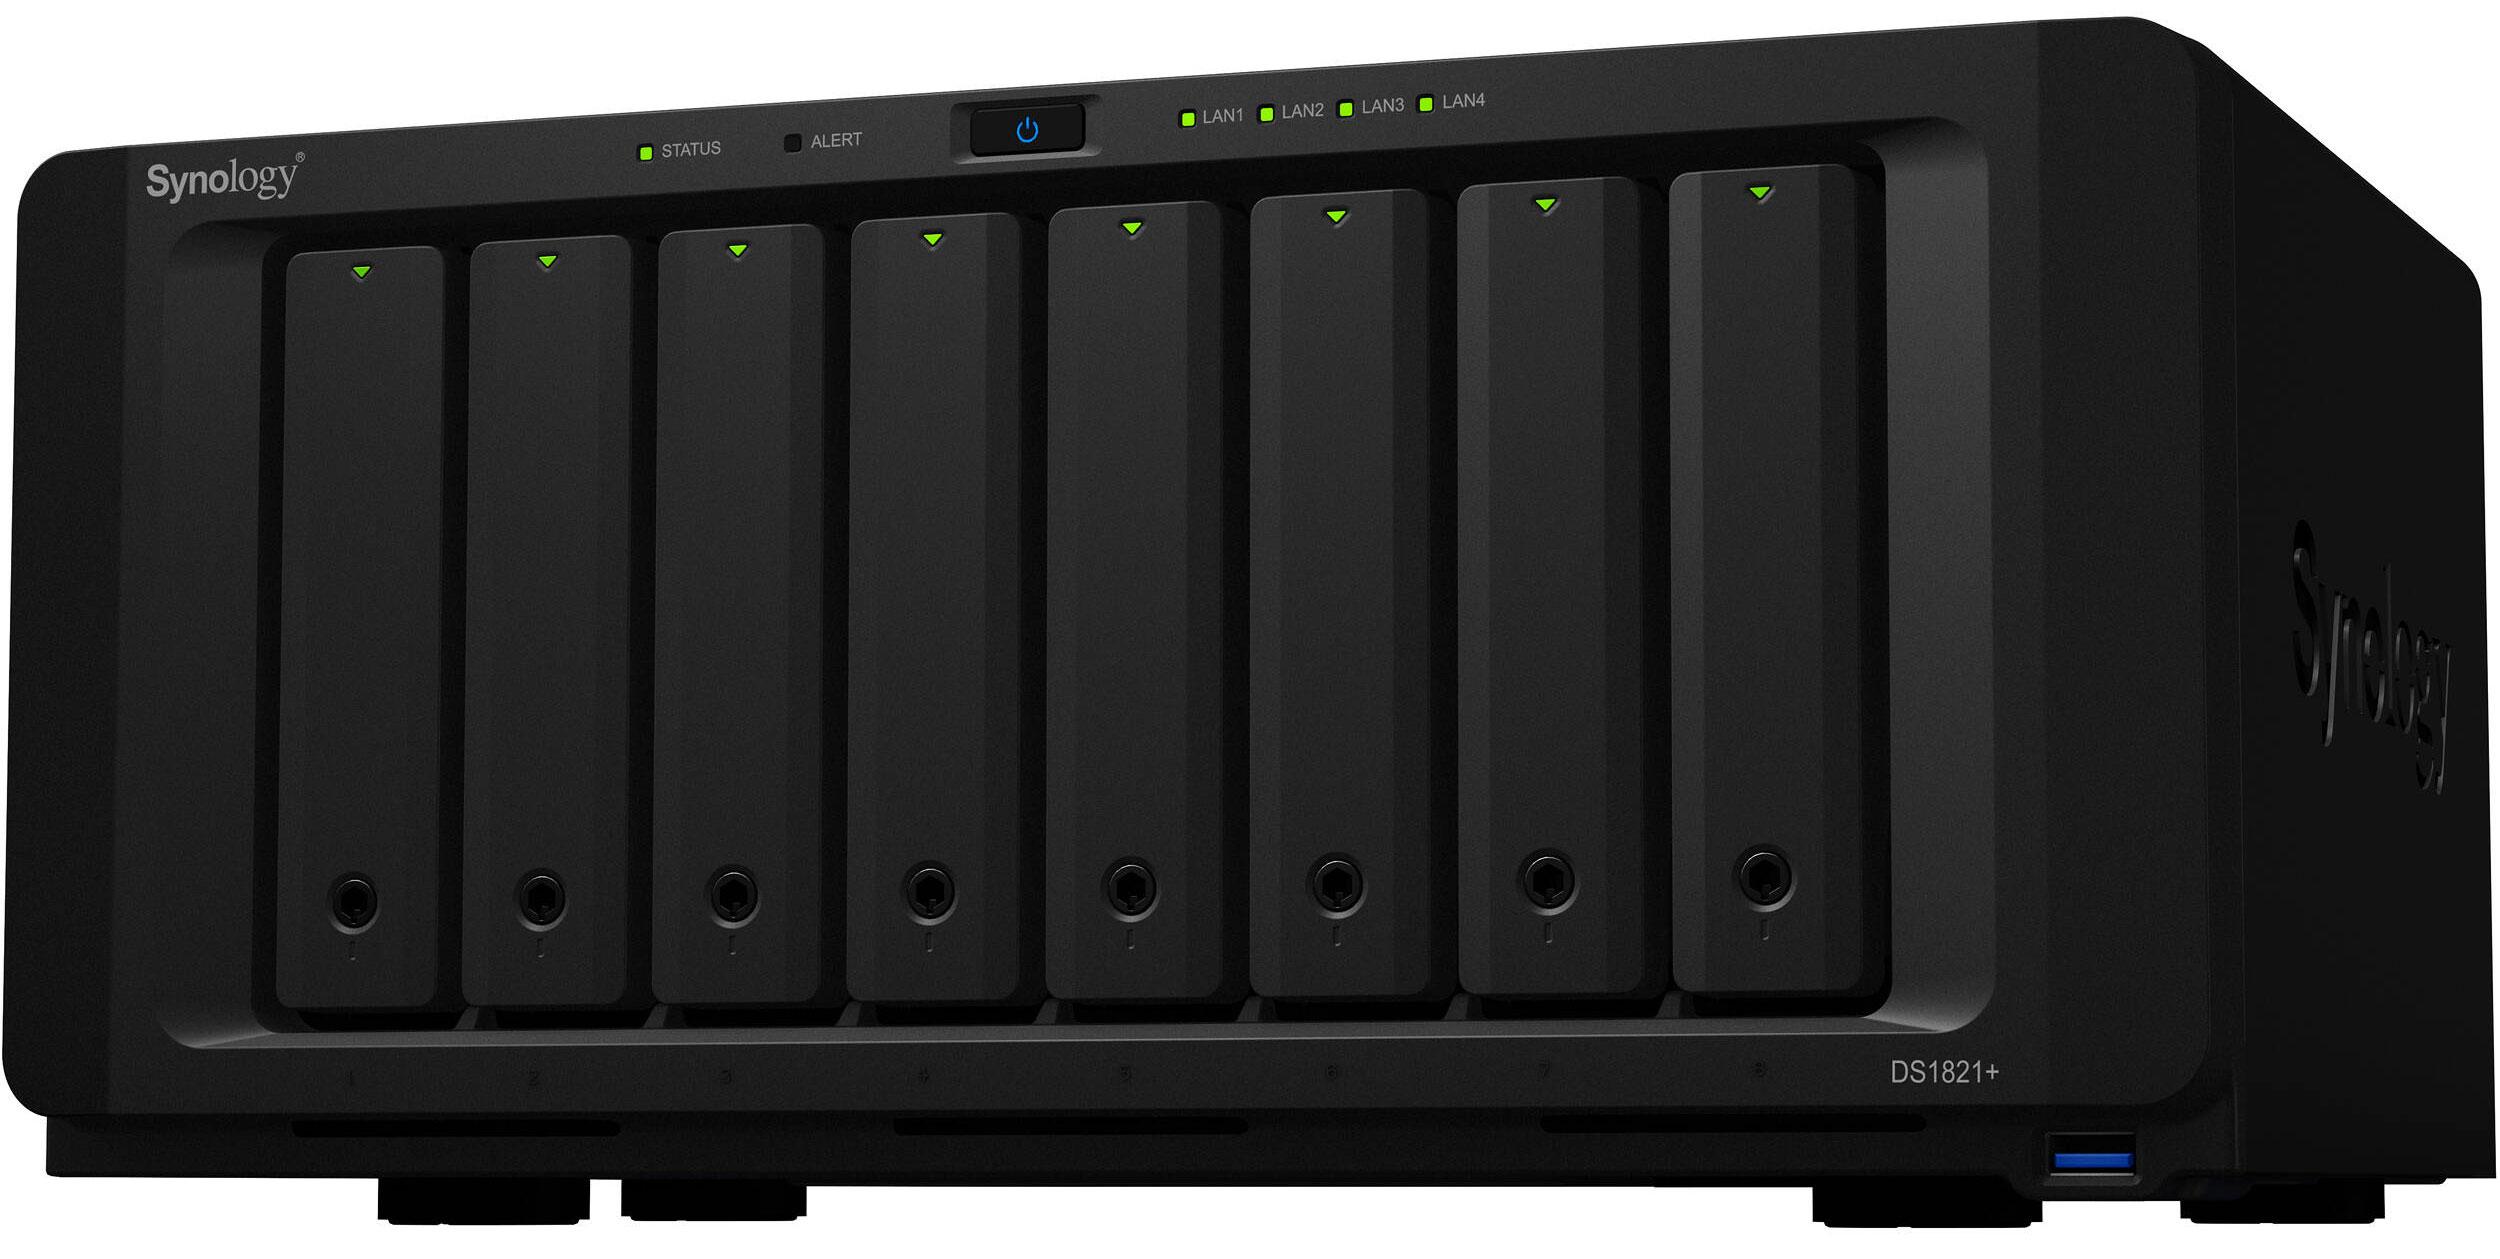 Synology DiskStation DS1821+ 8-Bay NAS Enclosure